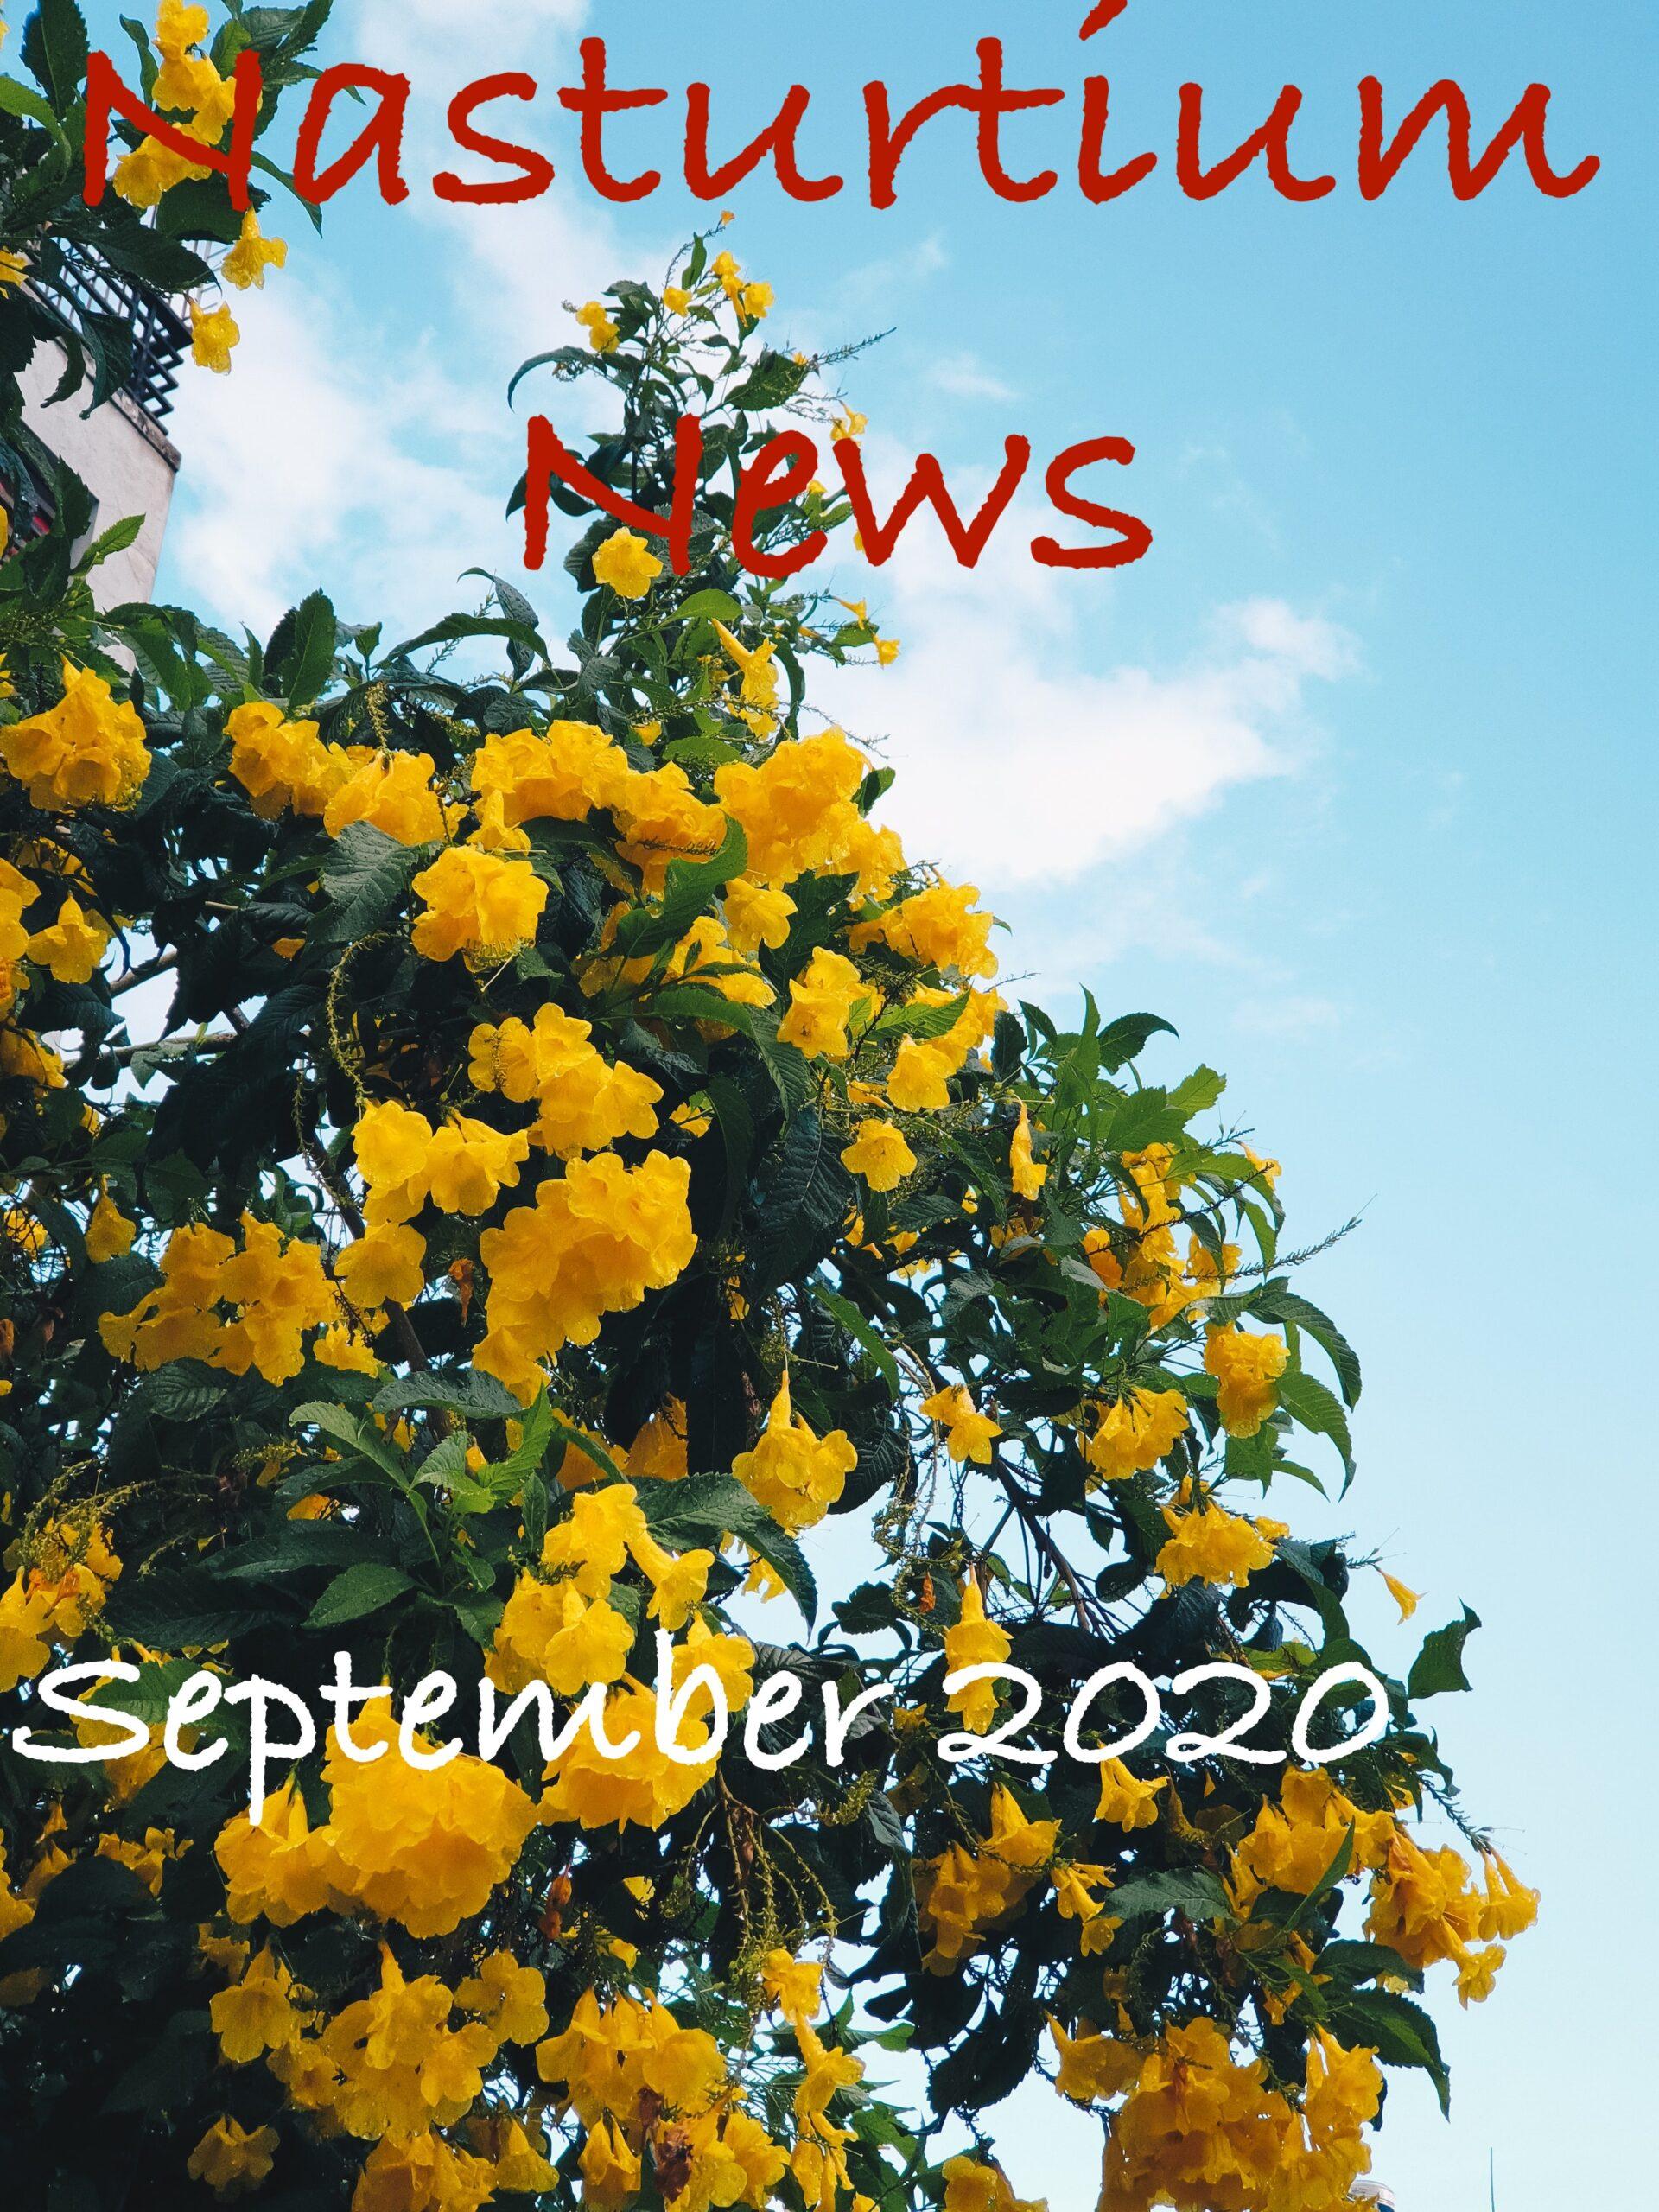 Nasturtium News September 2020